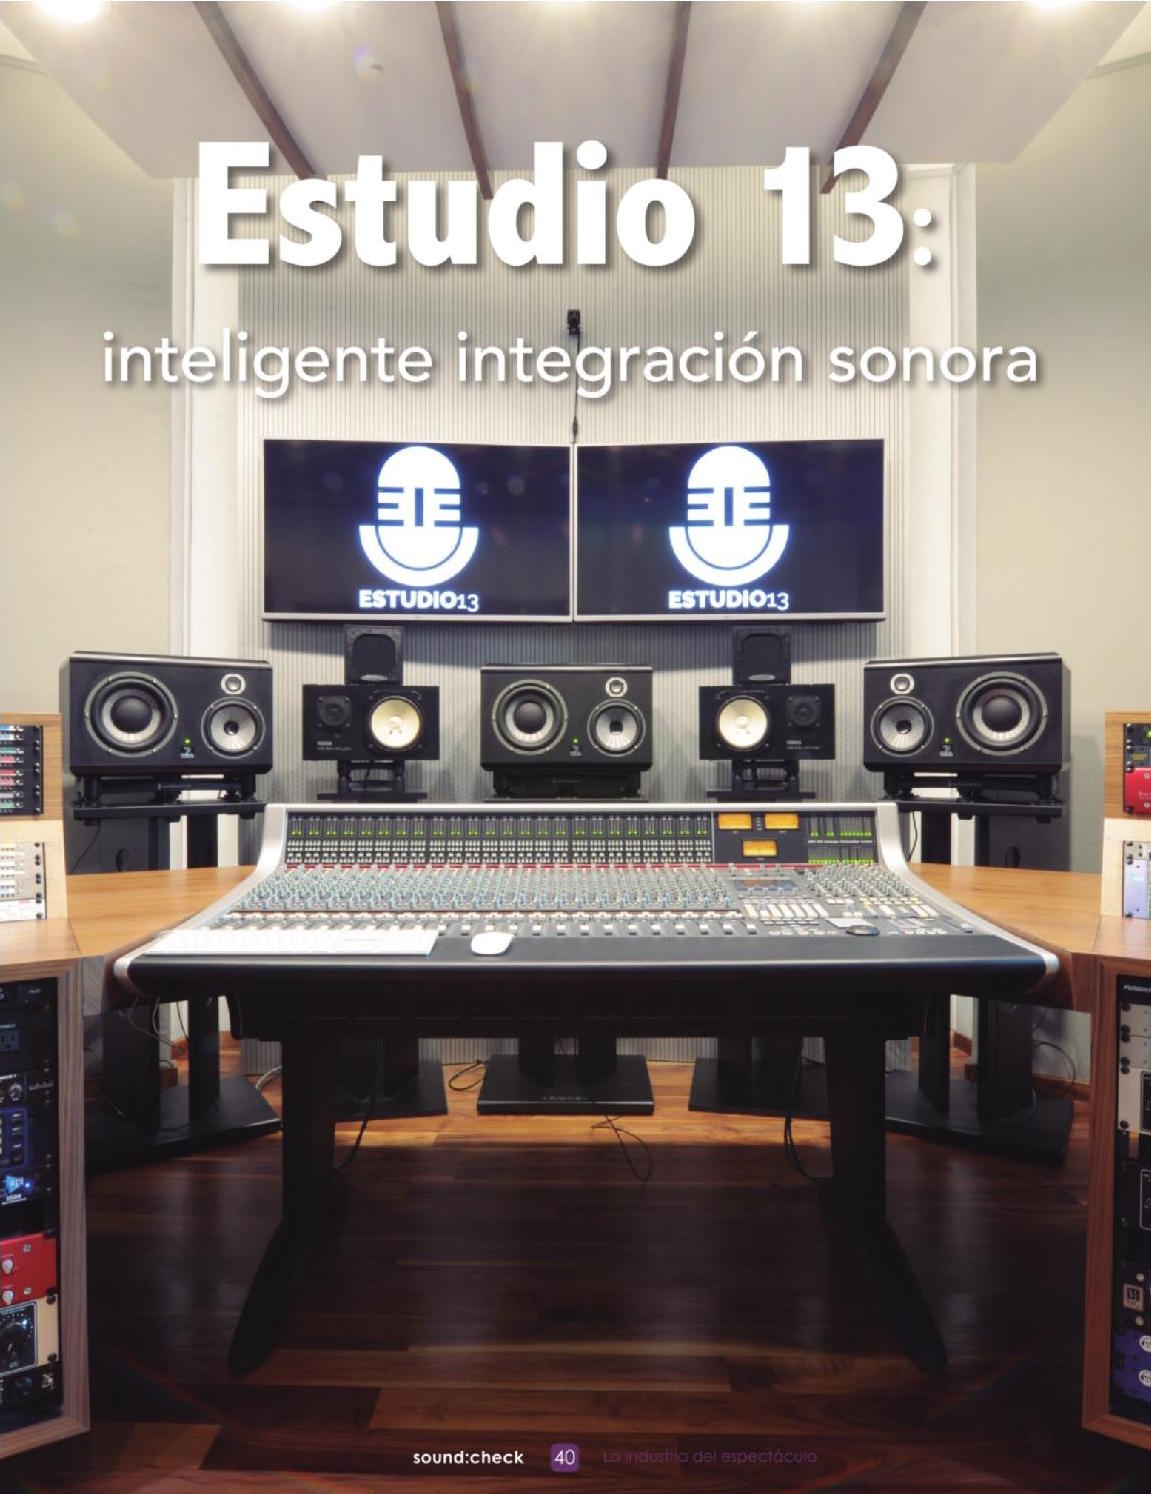 Estudio13-soundcheck-p1